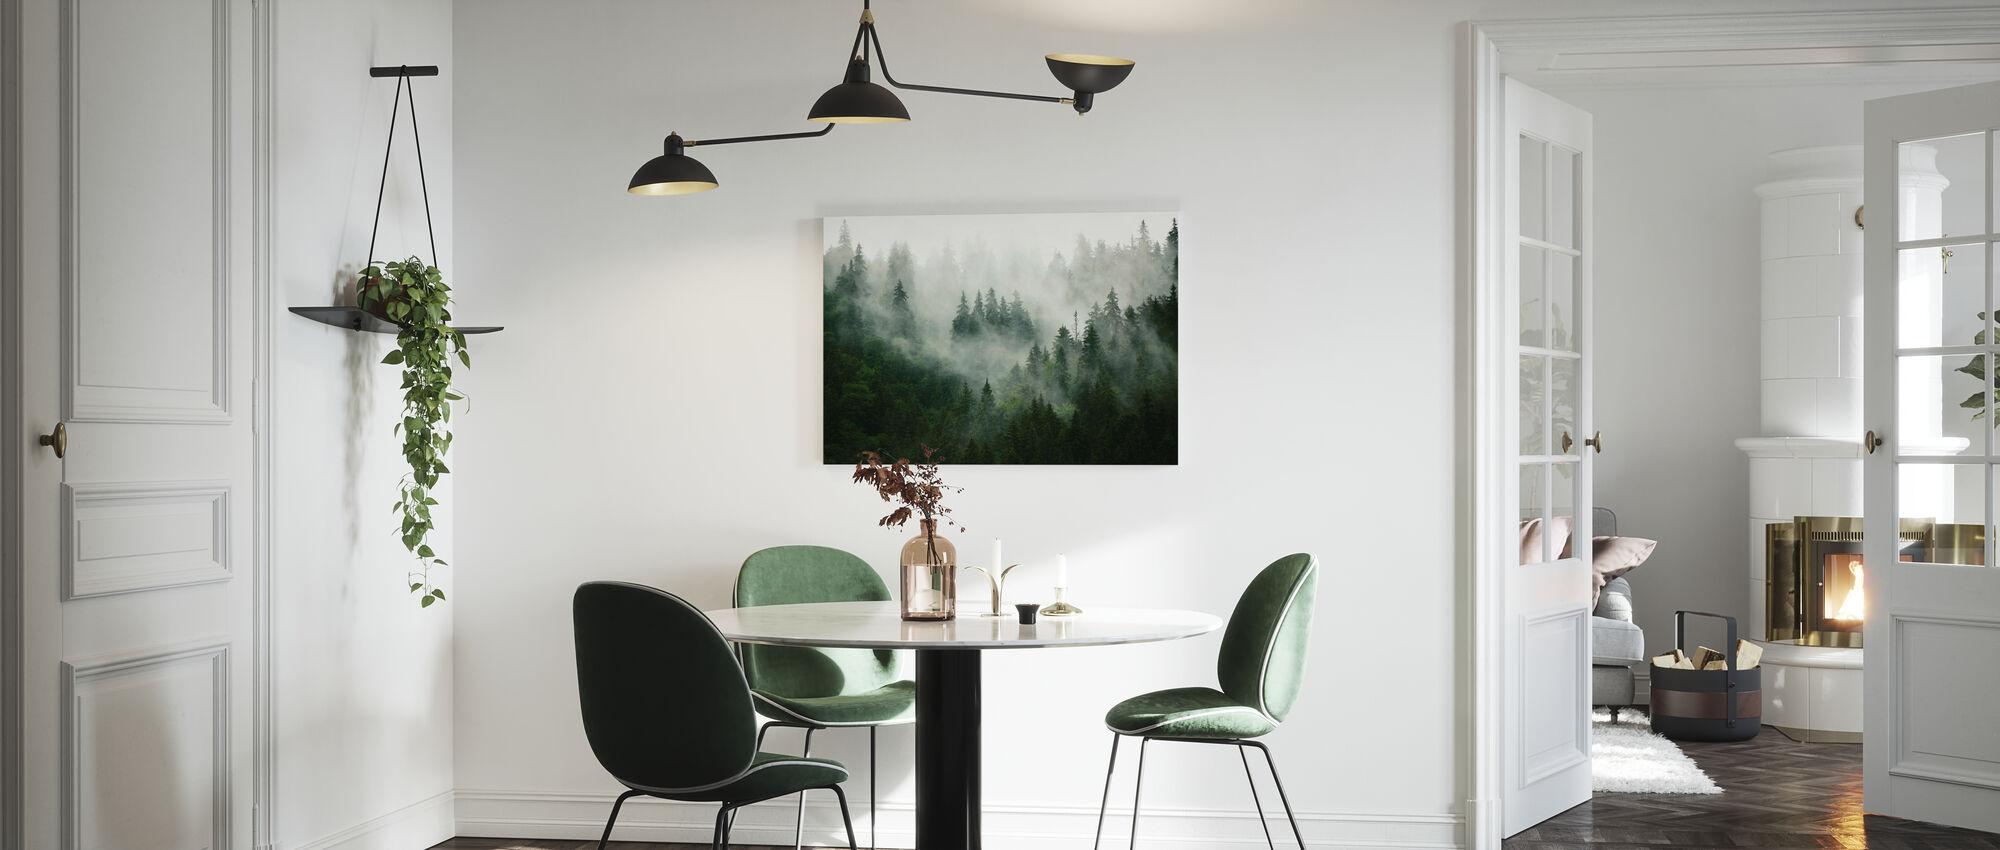 Foggy Forest - Canvas print - Kitchen